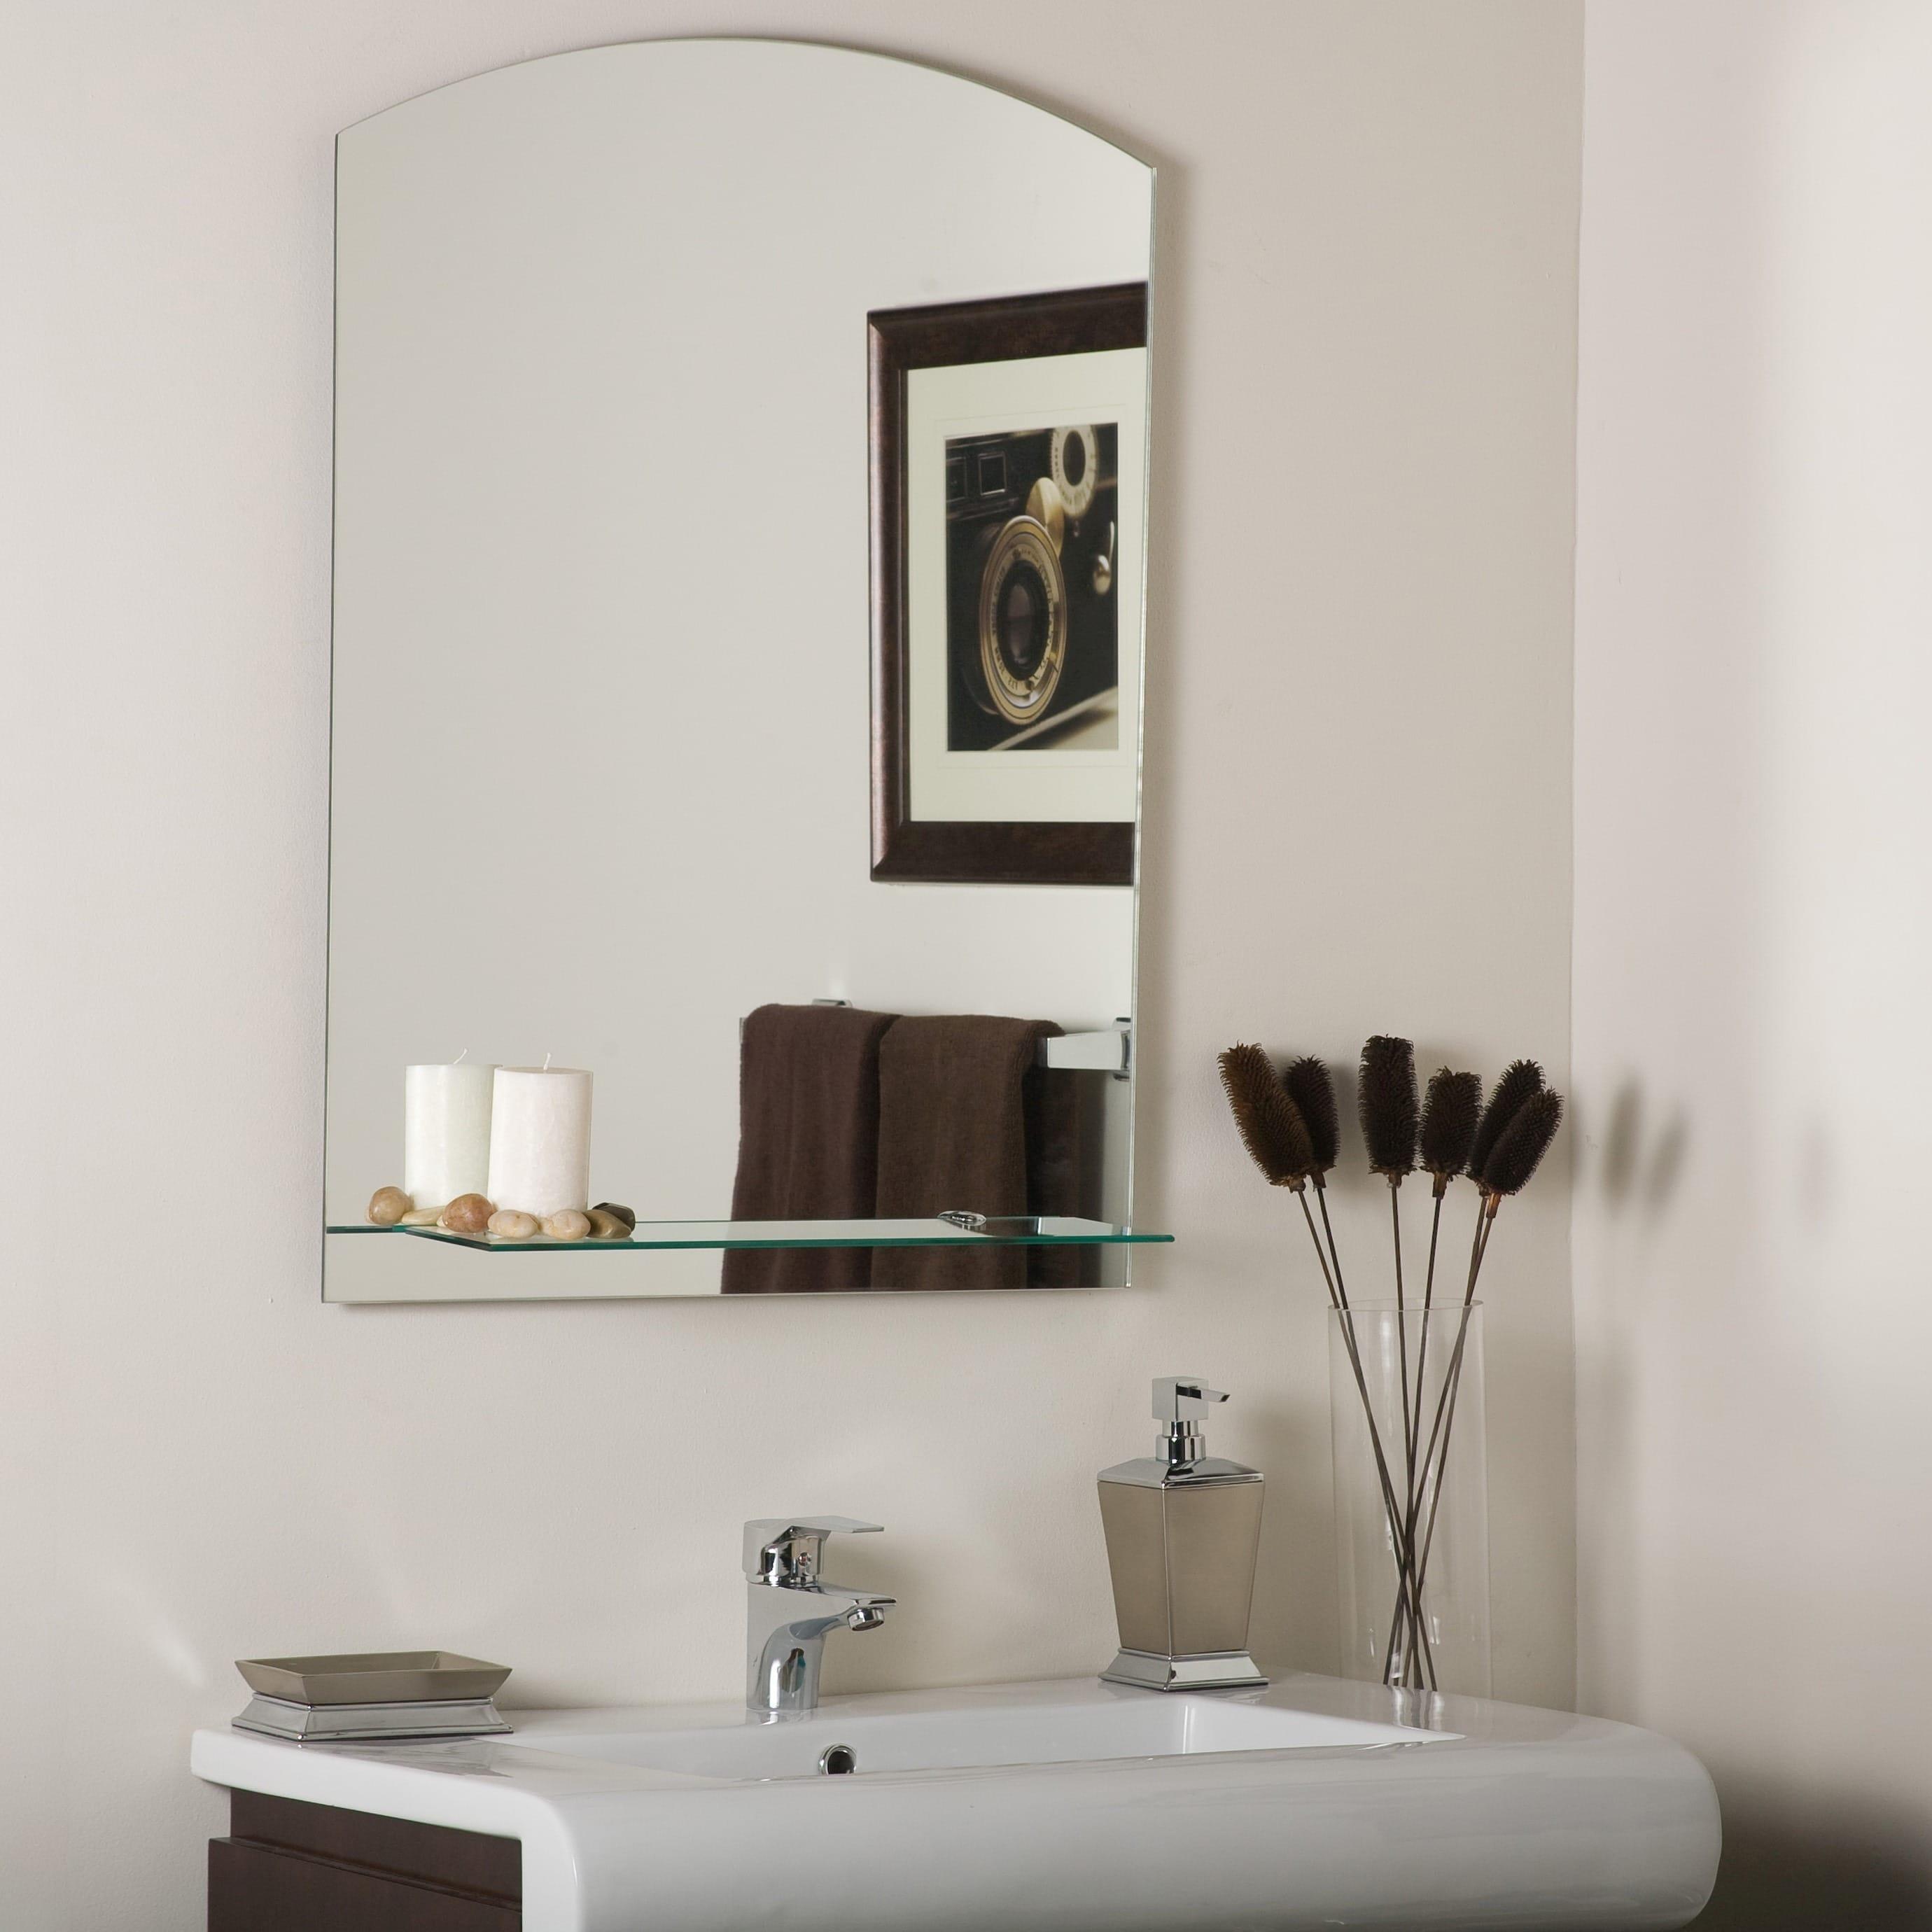 vinterior oval entryway statement framed over vintage bevelled mirror mantle with wooden edge listings large shelf hall